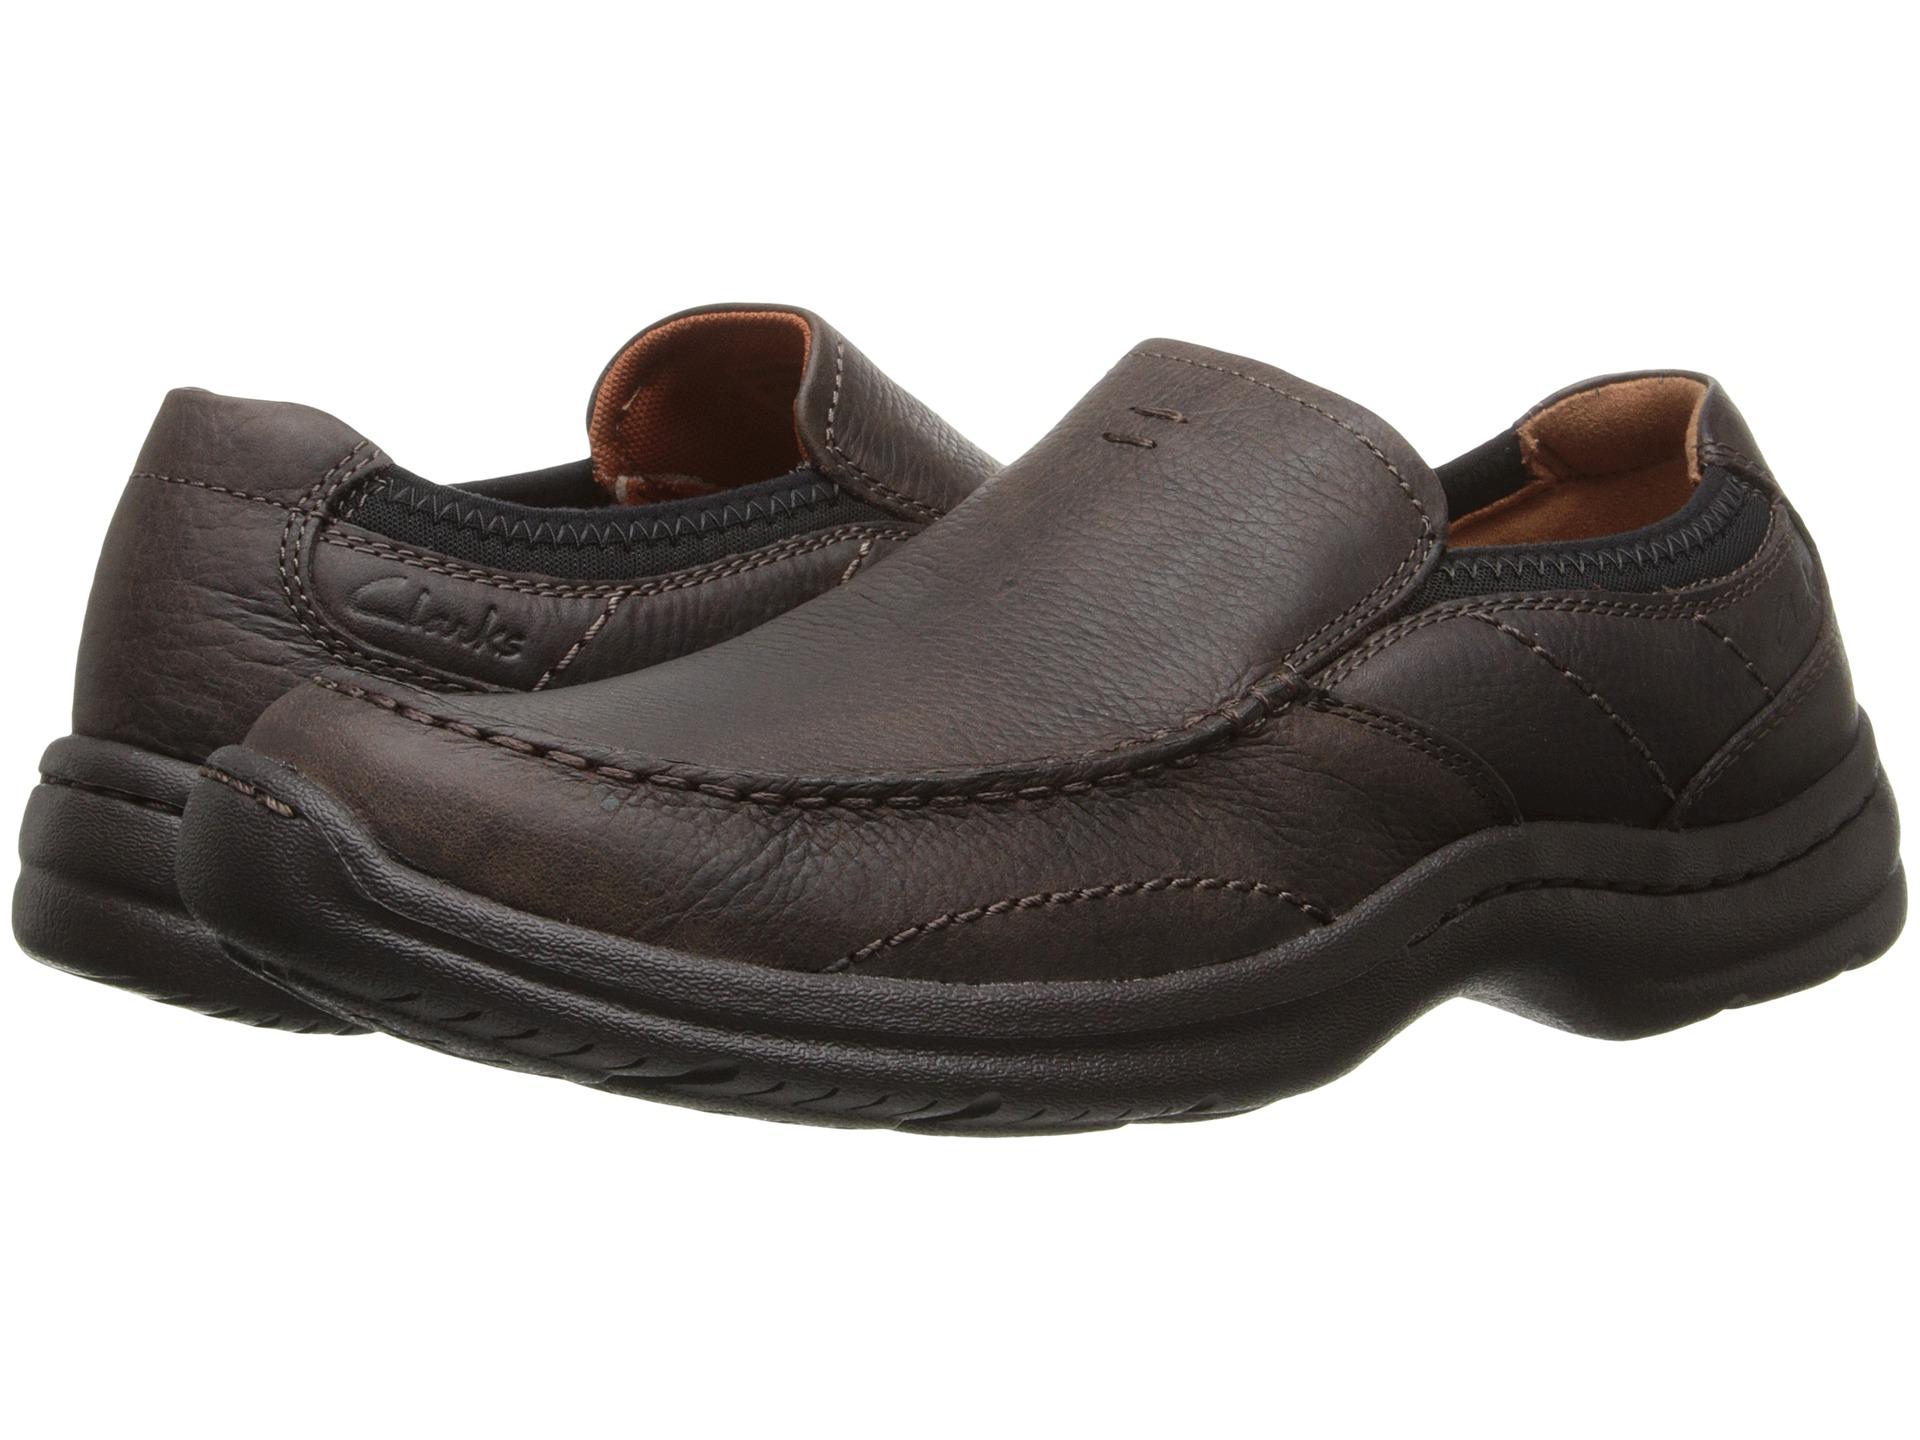 Демисезонные ботинки Clarks  2014 Niland Energy демисезонные ботинки clarks 2014 sidehill free